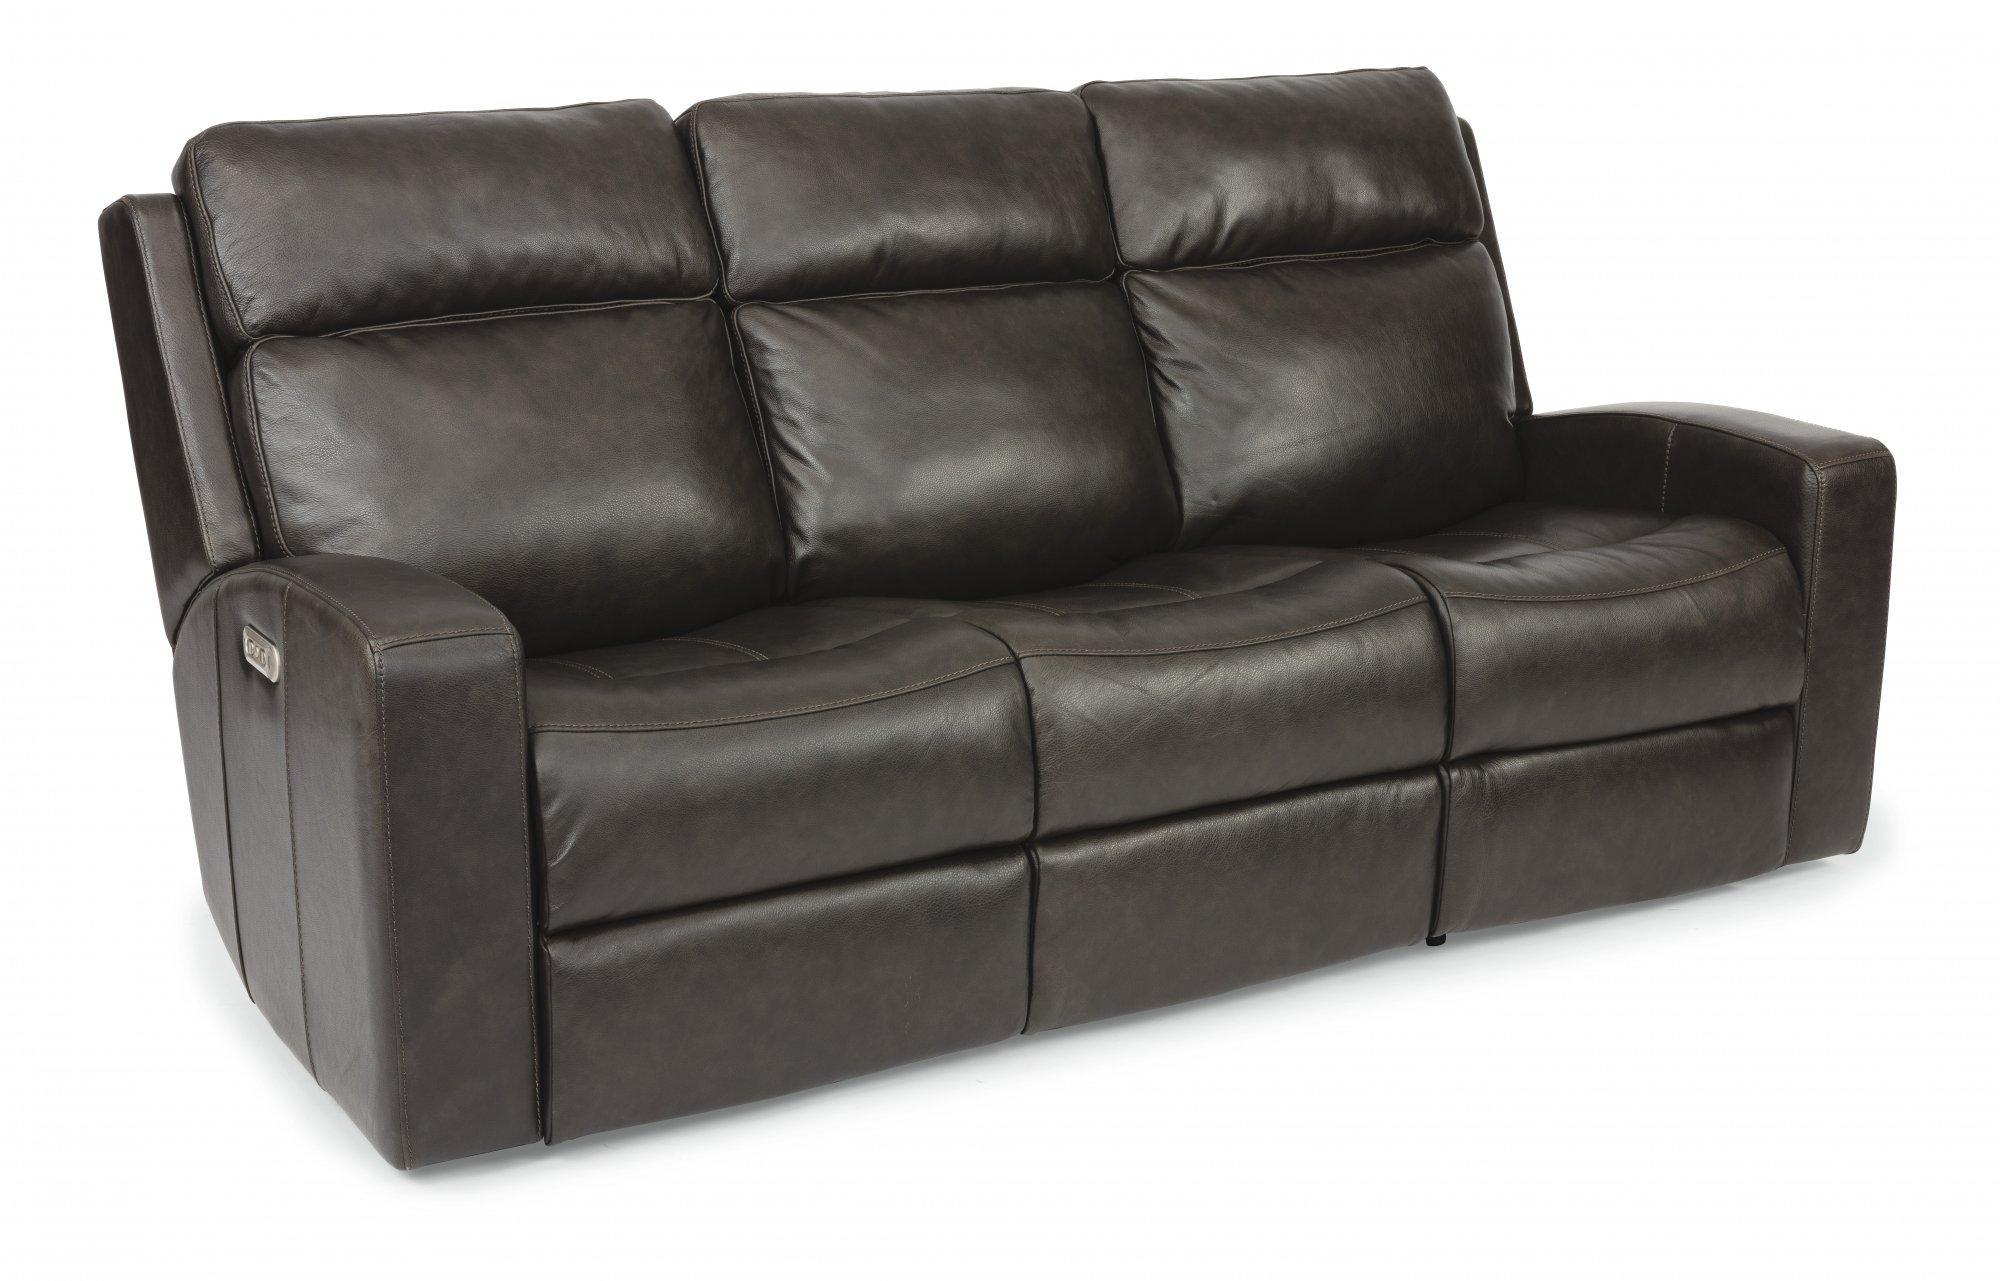 FlexsteelCody Power Reclining Sofa With Power Headrests